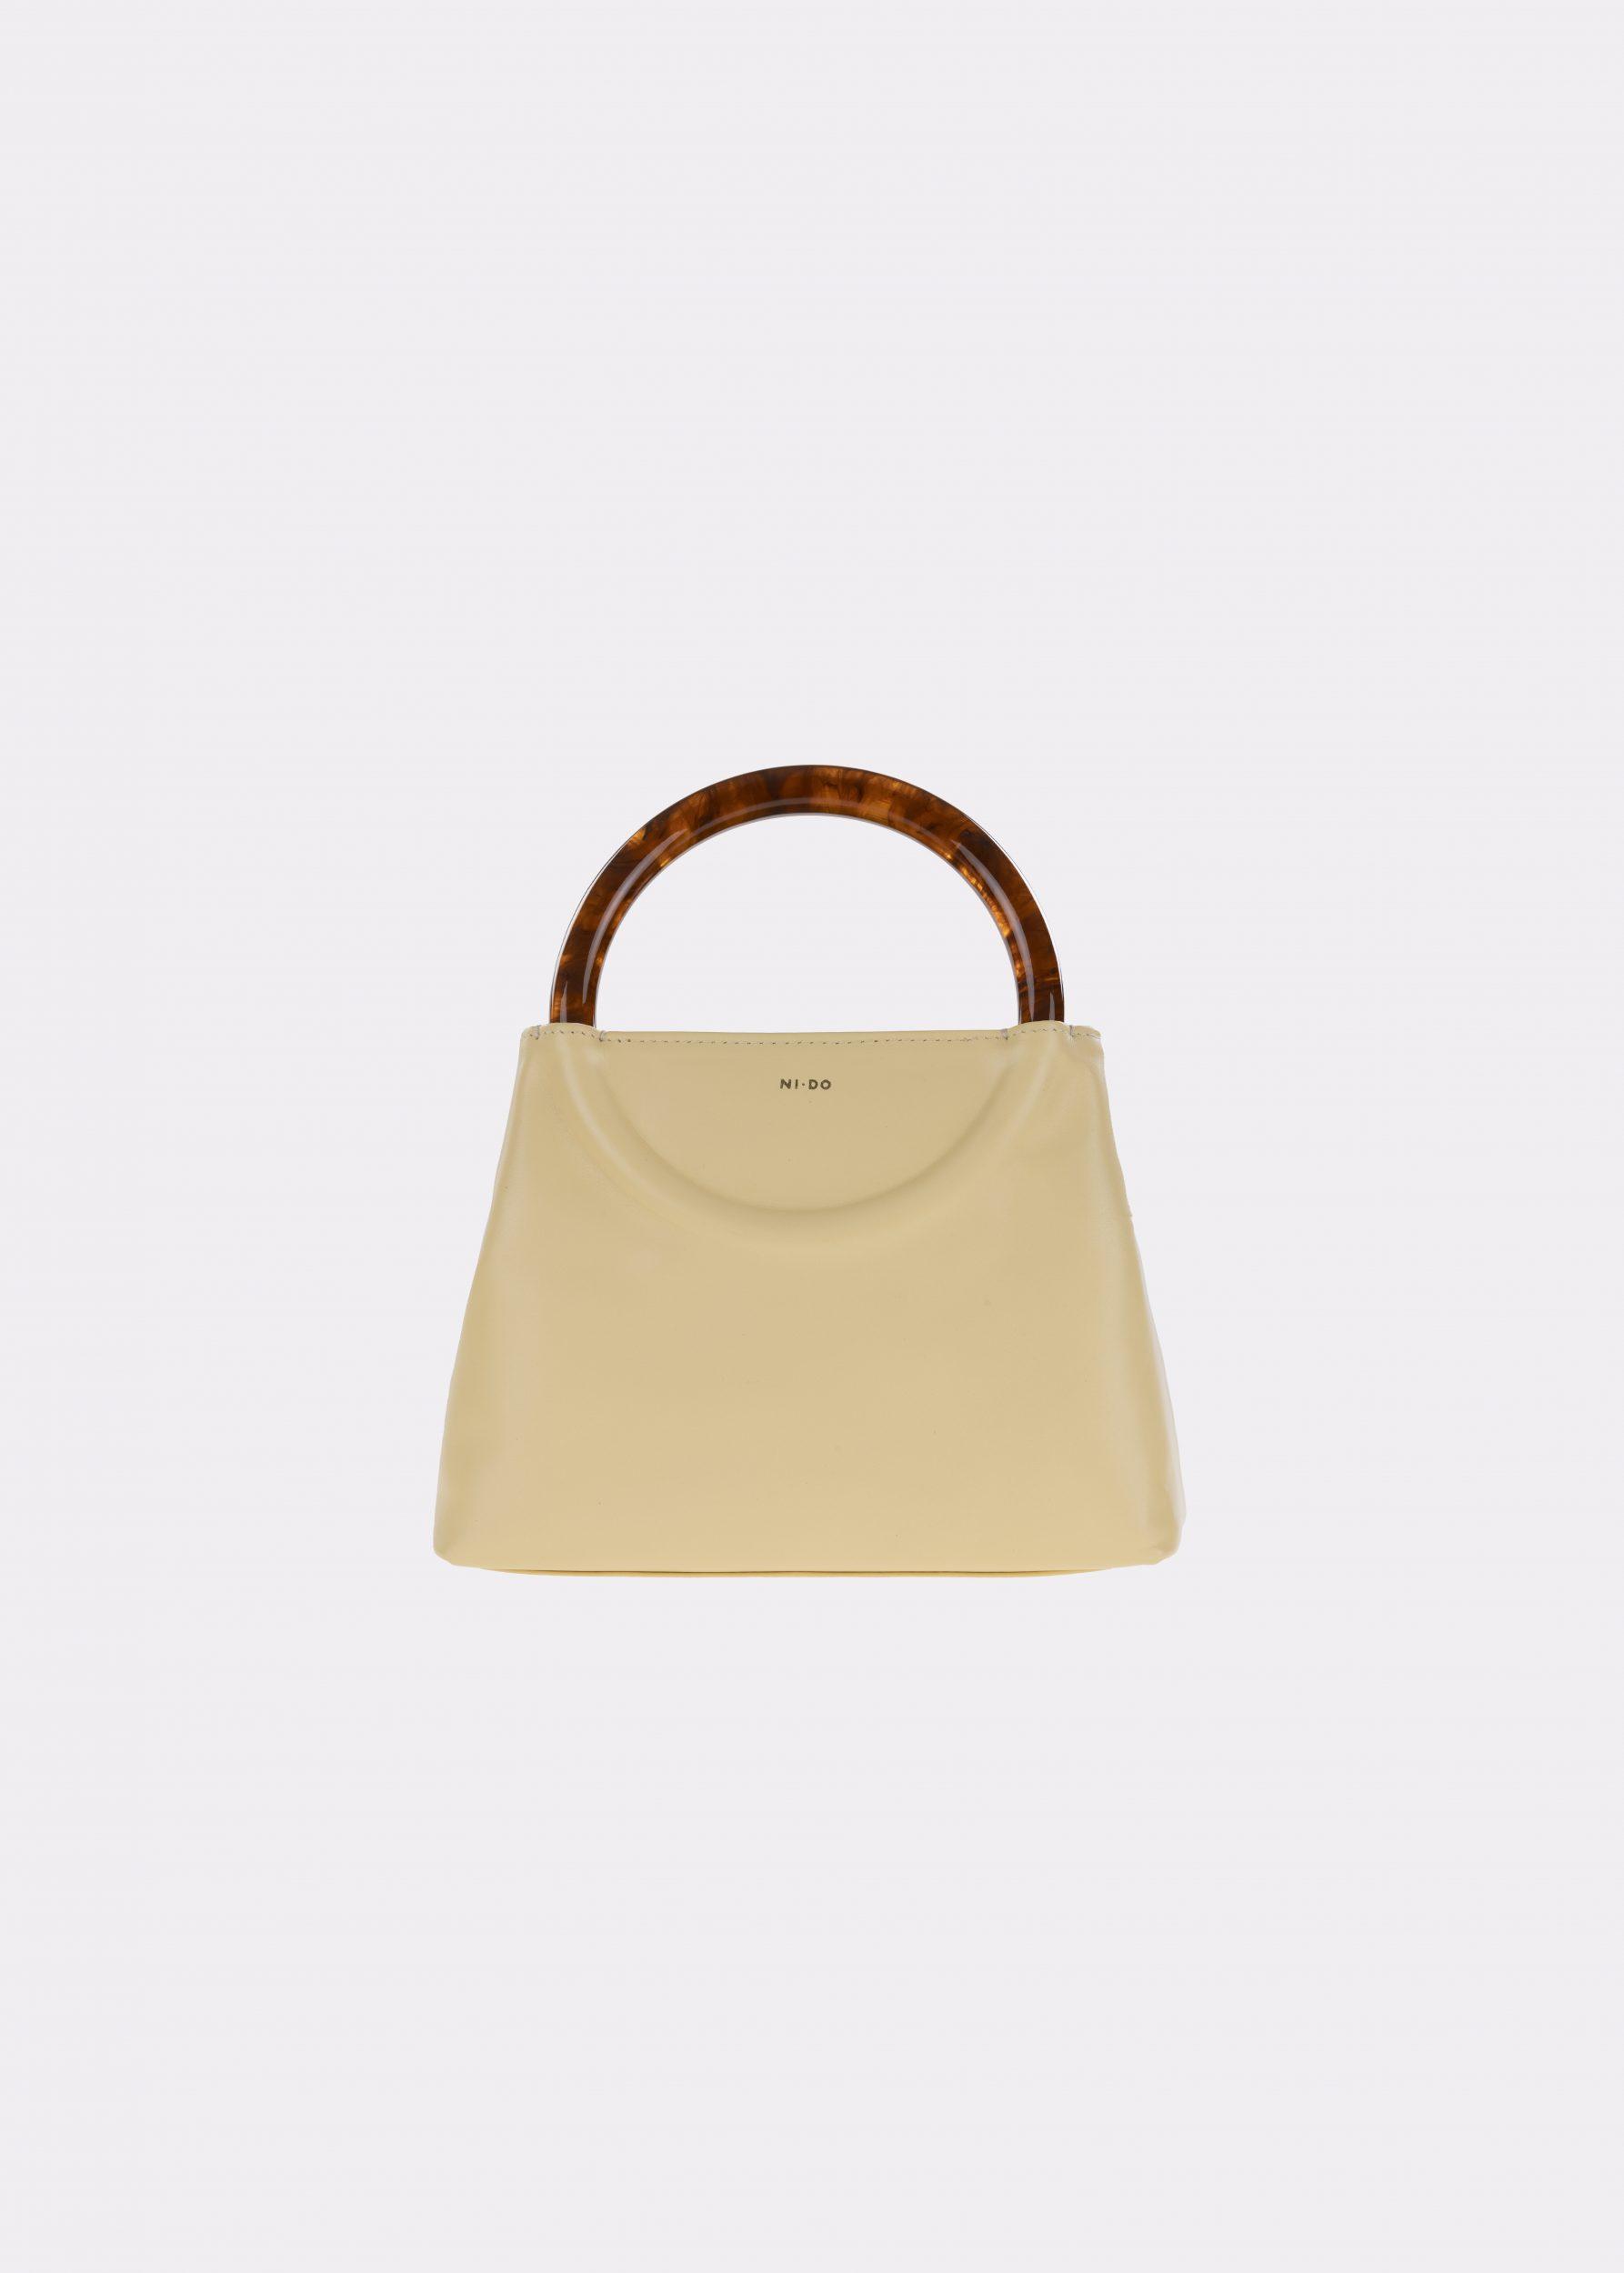 NIDO-Bolla_Mini-bag-lemontart-Amber_front view